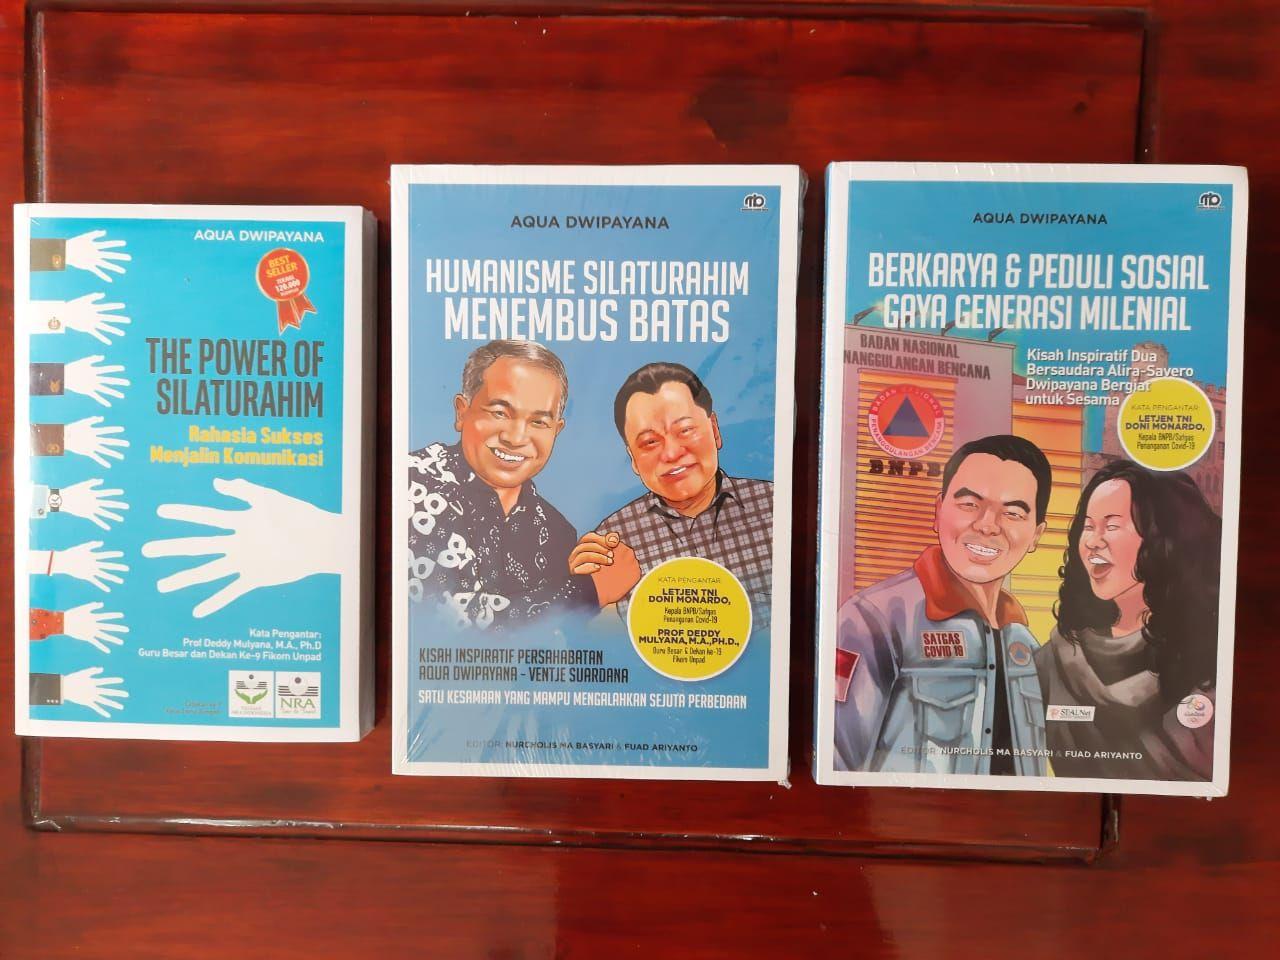 Trilogi buku dari karya Pakar Komunikasi dan Motivator Nasional Dr Aqua Dwipayana. (Foto: Dok/Tugu Jatim)